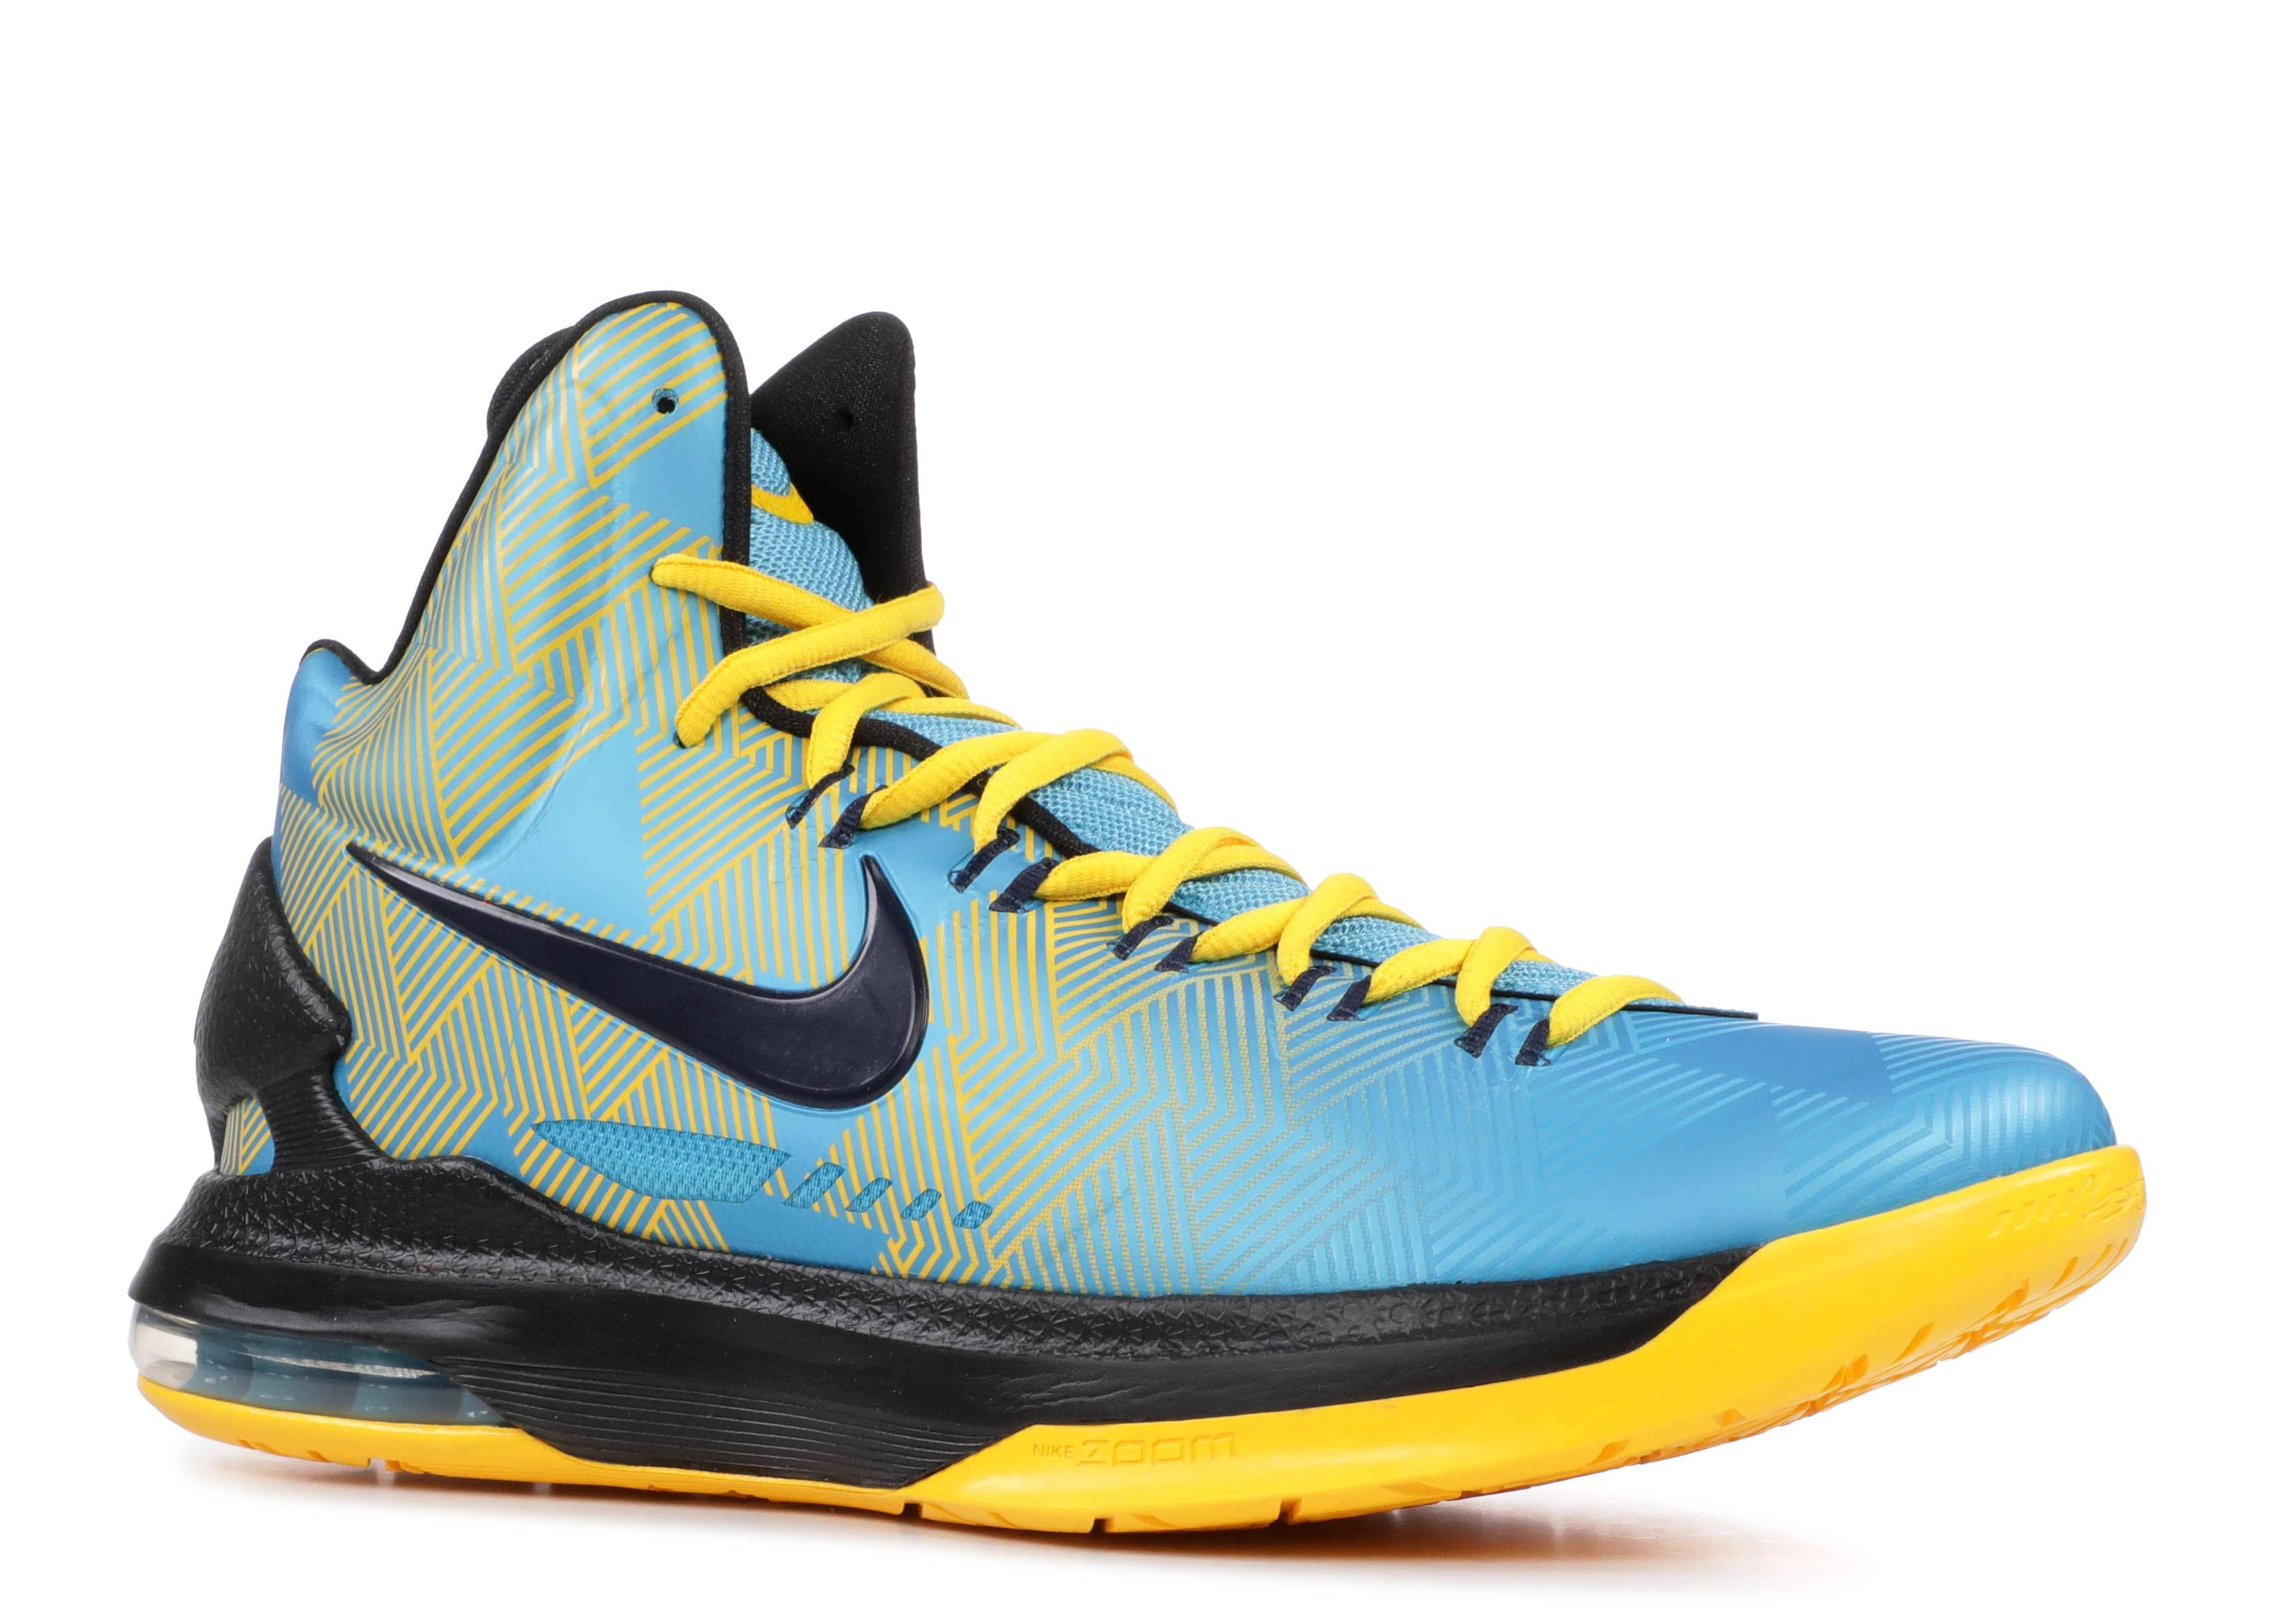 sports shoes a9020 f5081 Kd 5 N7